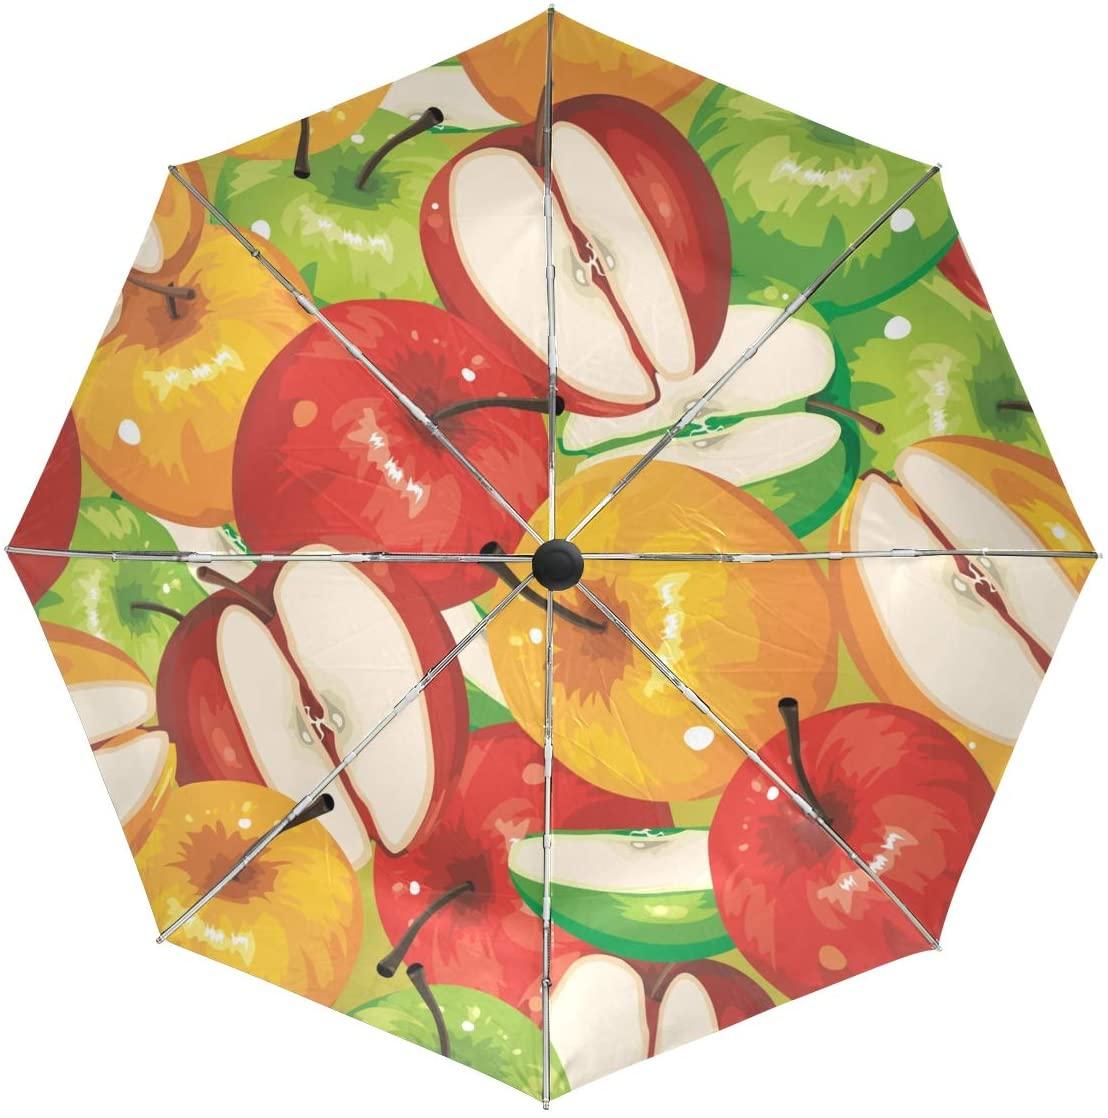 Senuu Colorule Apple Umbrella Large Travel Auto Open Close Sun Blocking Umbrellas for Women Men